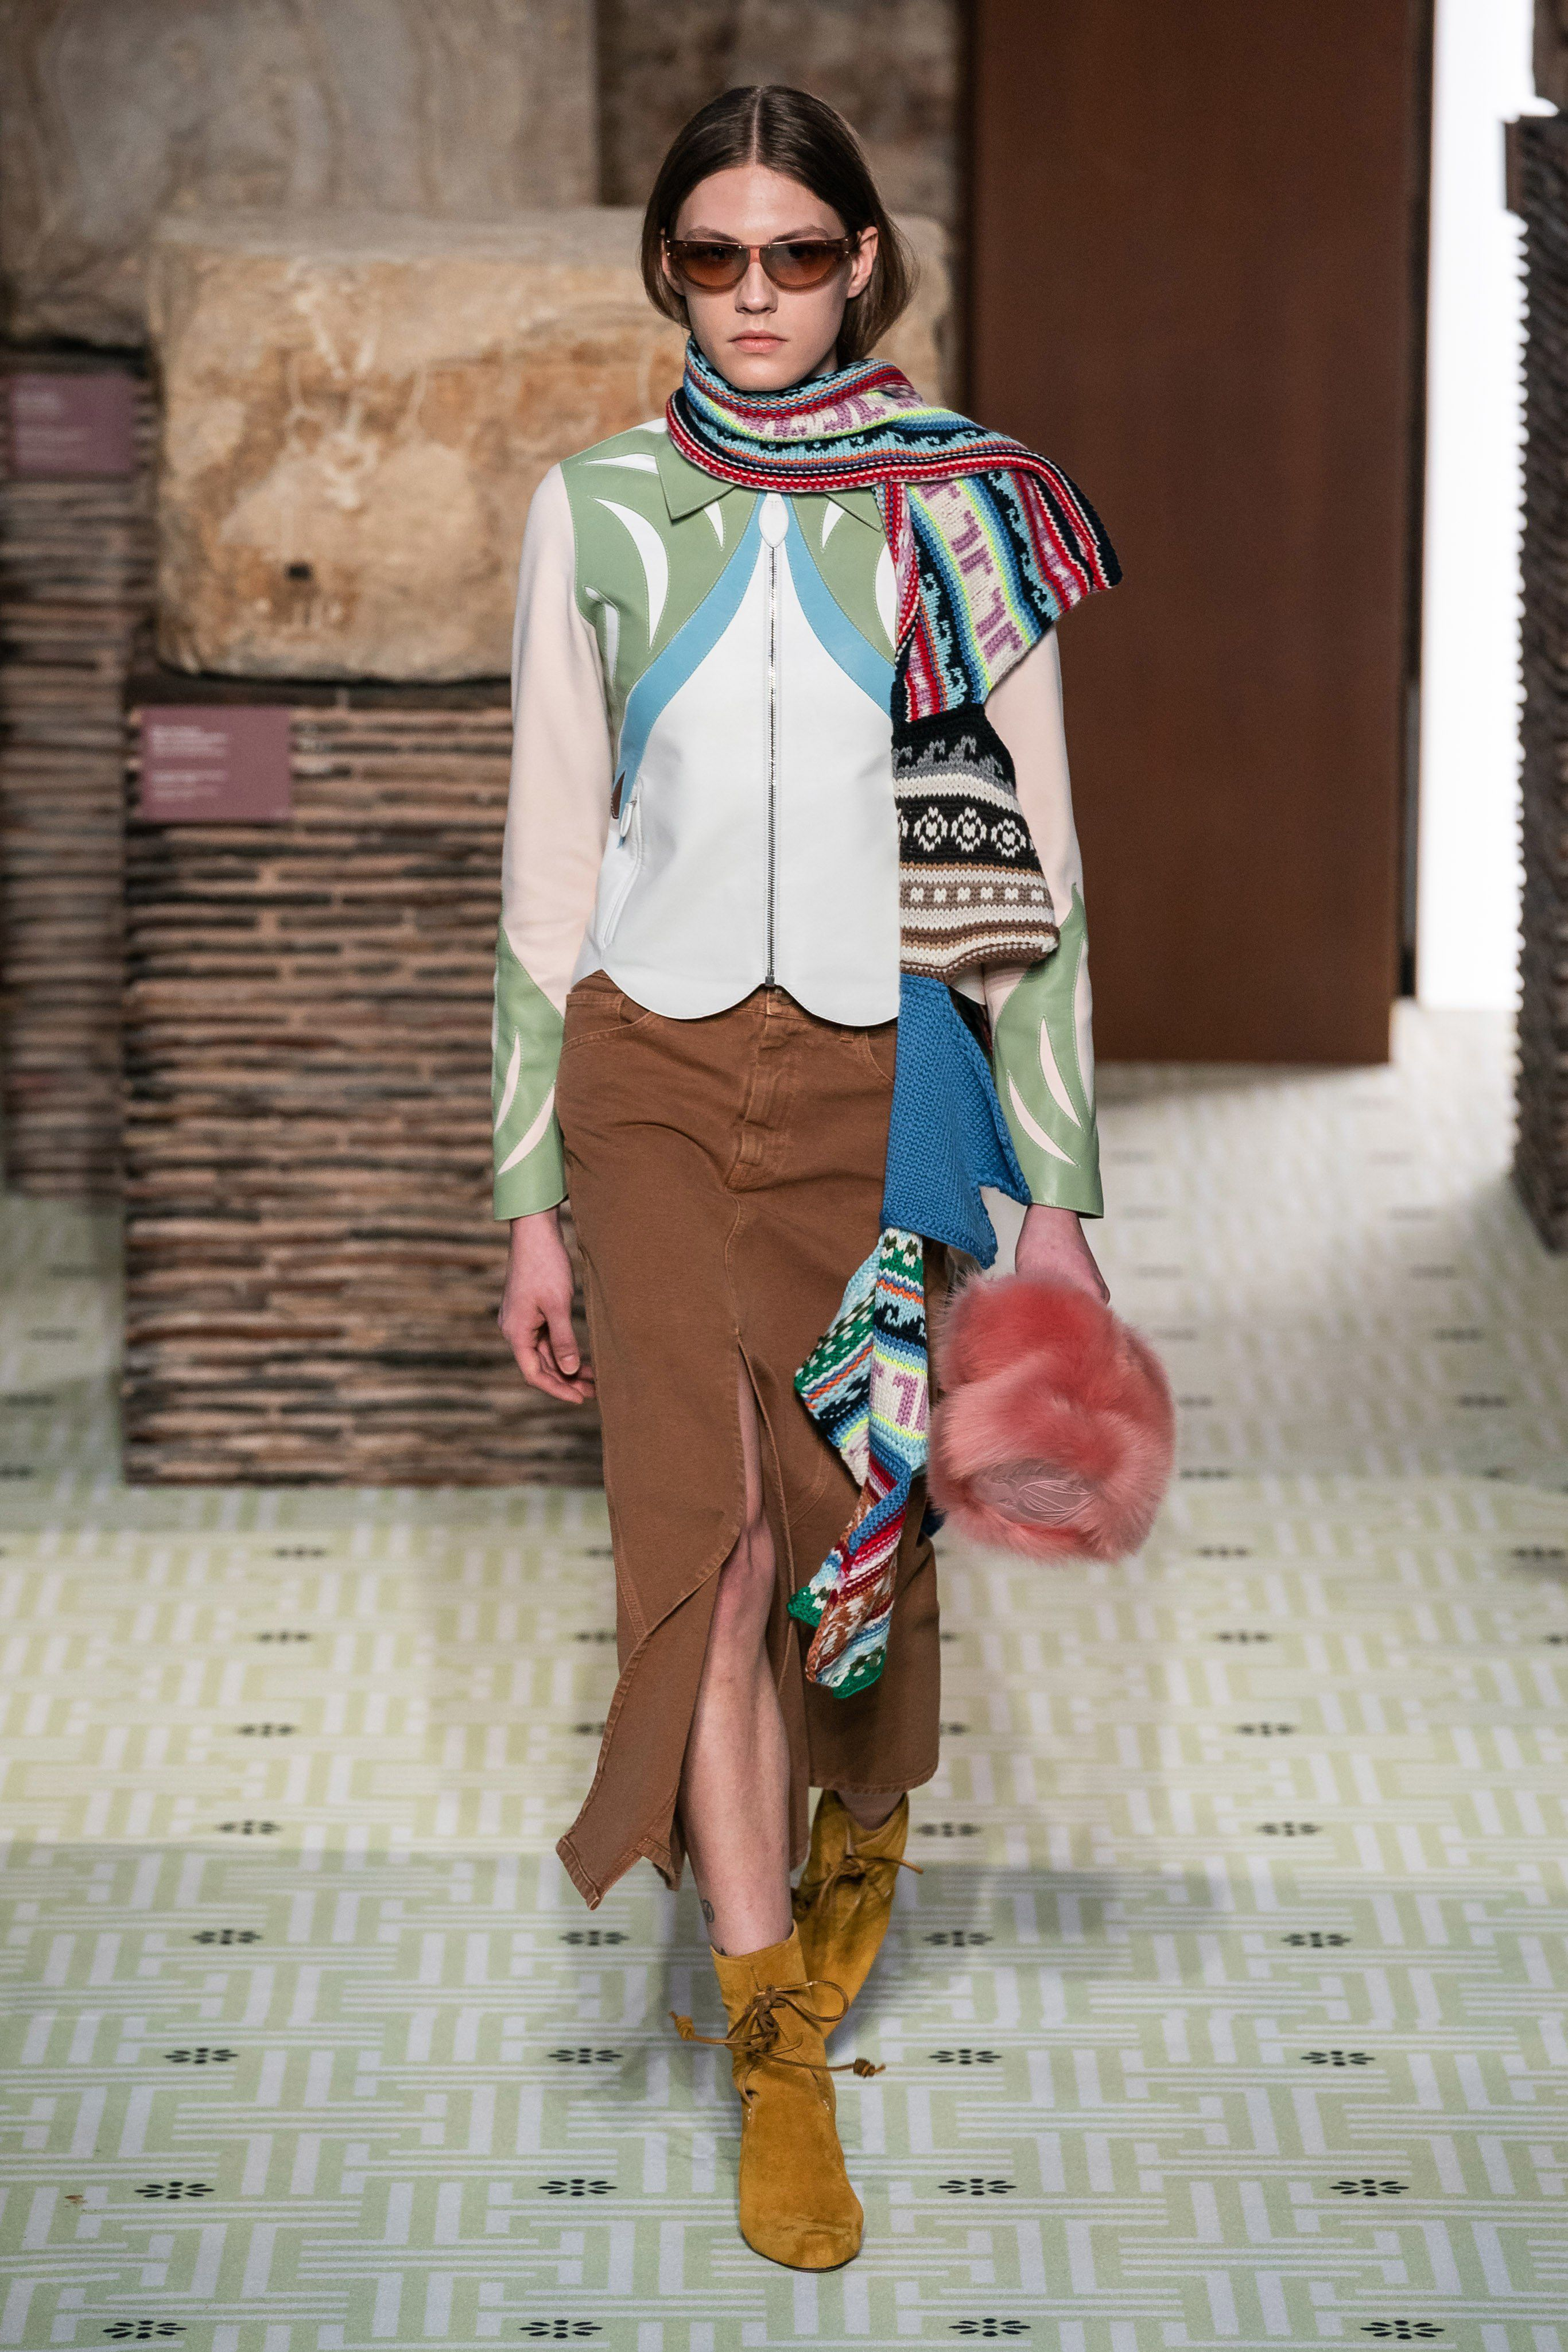 Lanvin Fall 2019 Ready To Wear Fashion Show Collection See The Complete Lanvin Fall 2019 Ready To Wear Fashion Leggings Fashion